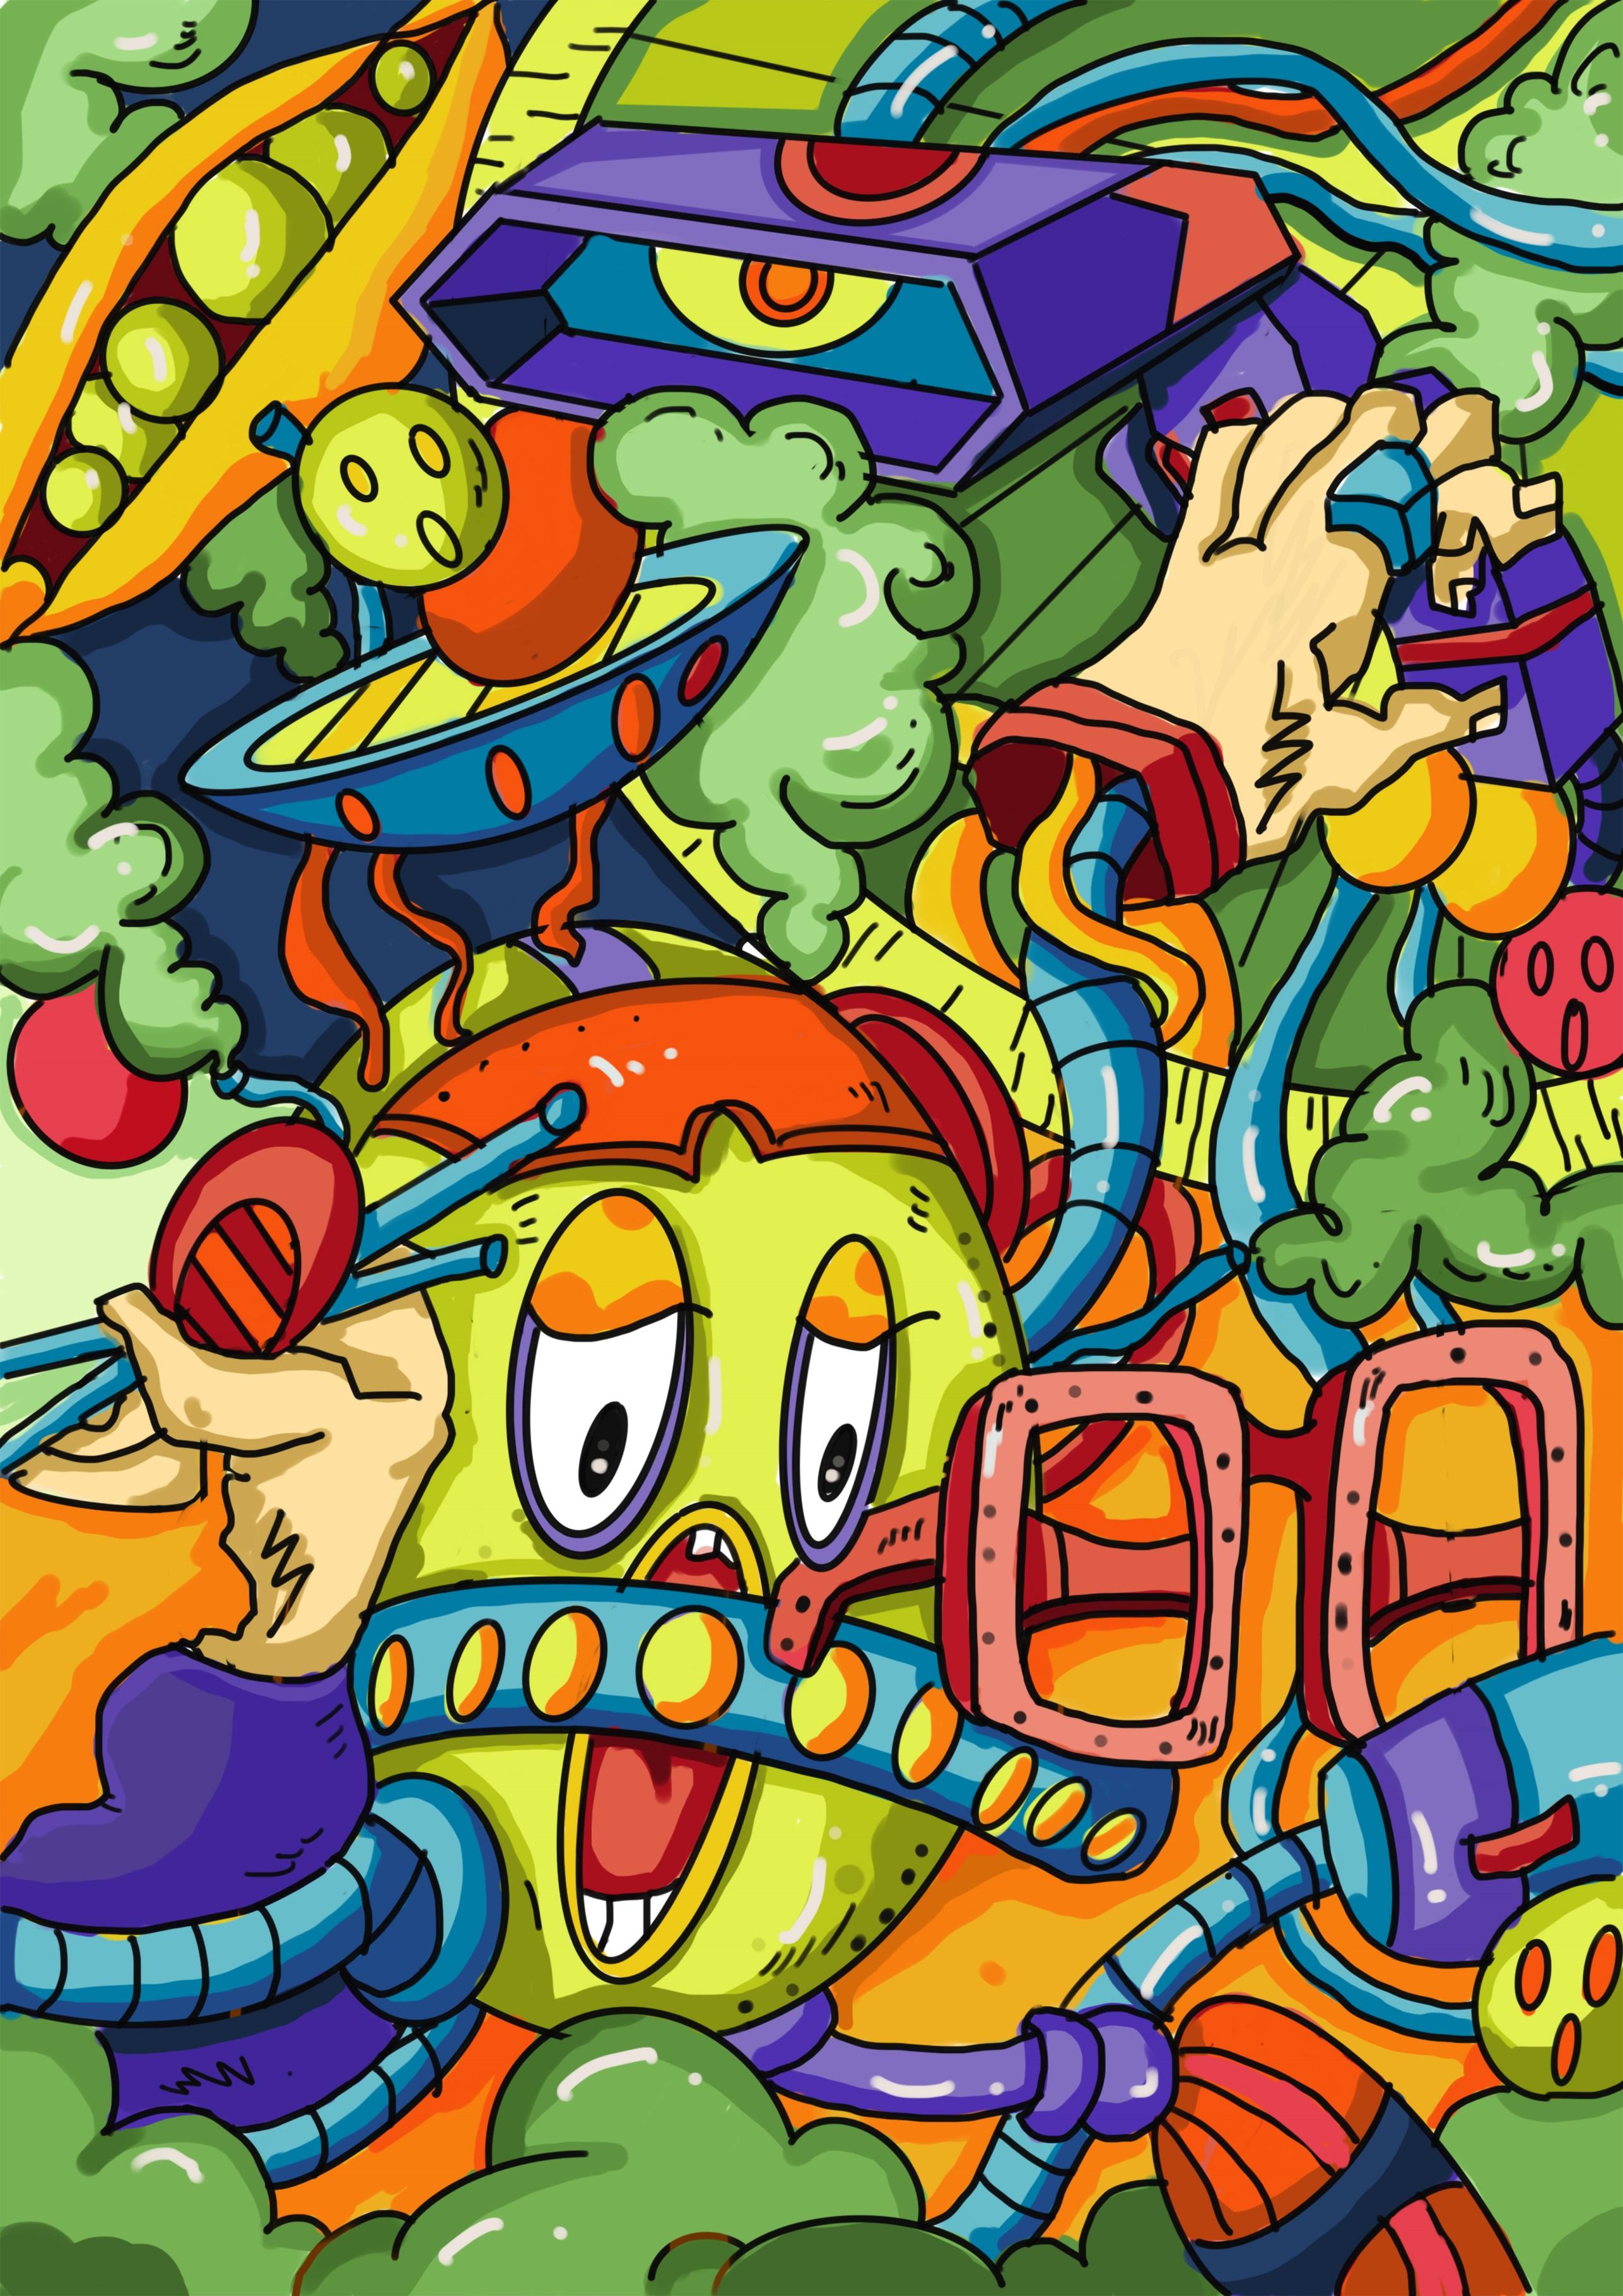 E:\2020国际大学生手绘艺术与设计大赛\参赛作品\手绘设计类\手绘设计类 南昌大学-谷物故事汇—如果粮食有情绪-胡青\参赛作品\一颗绿豆的惊讶.jpg